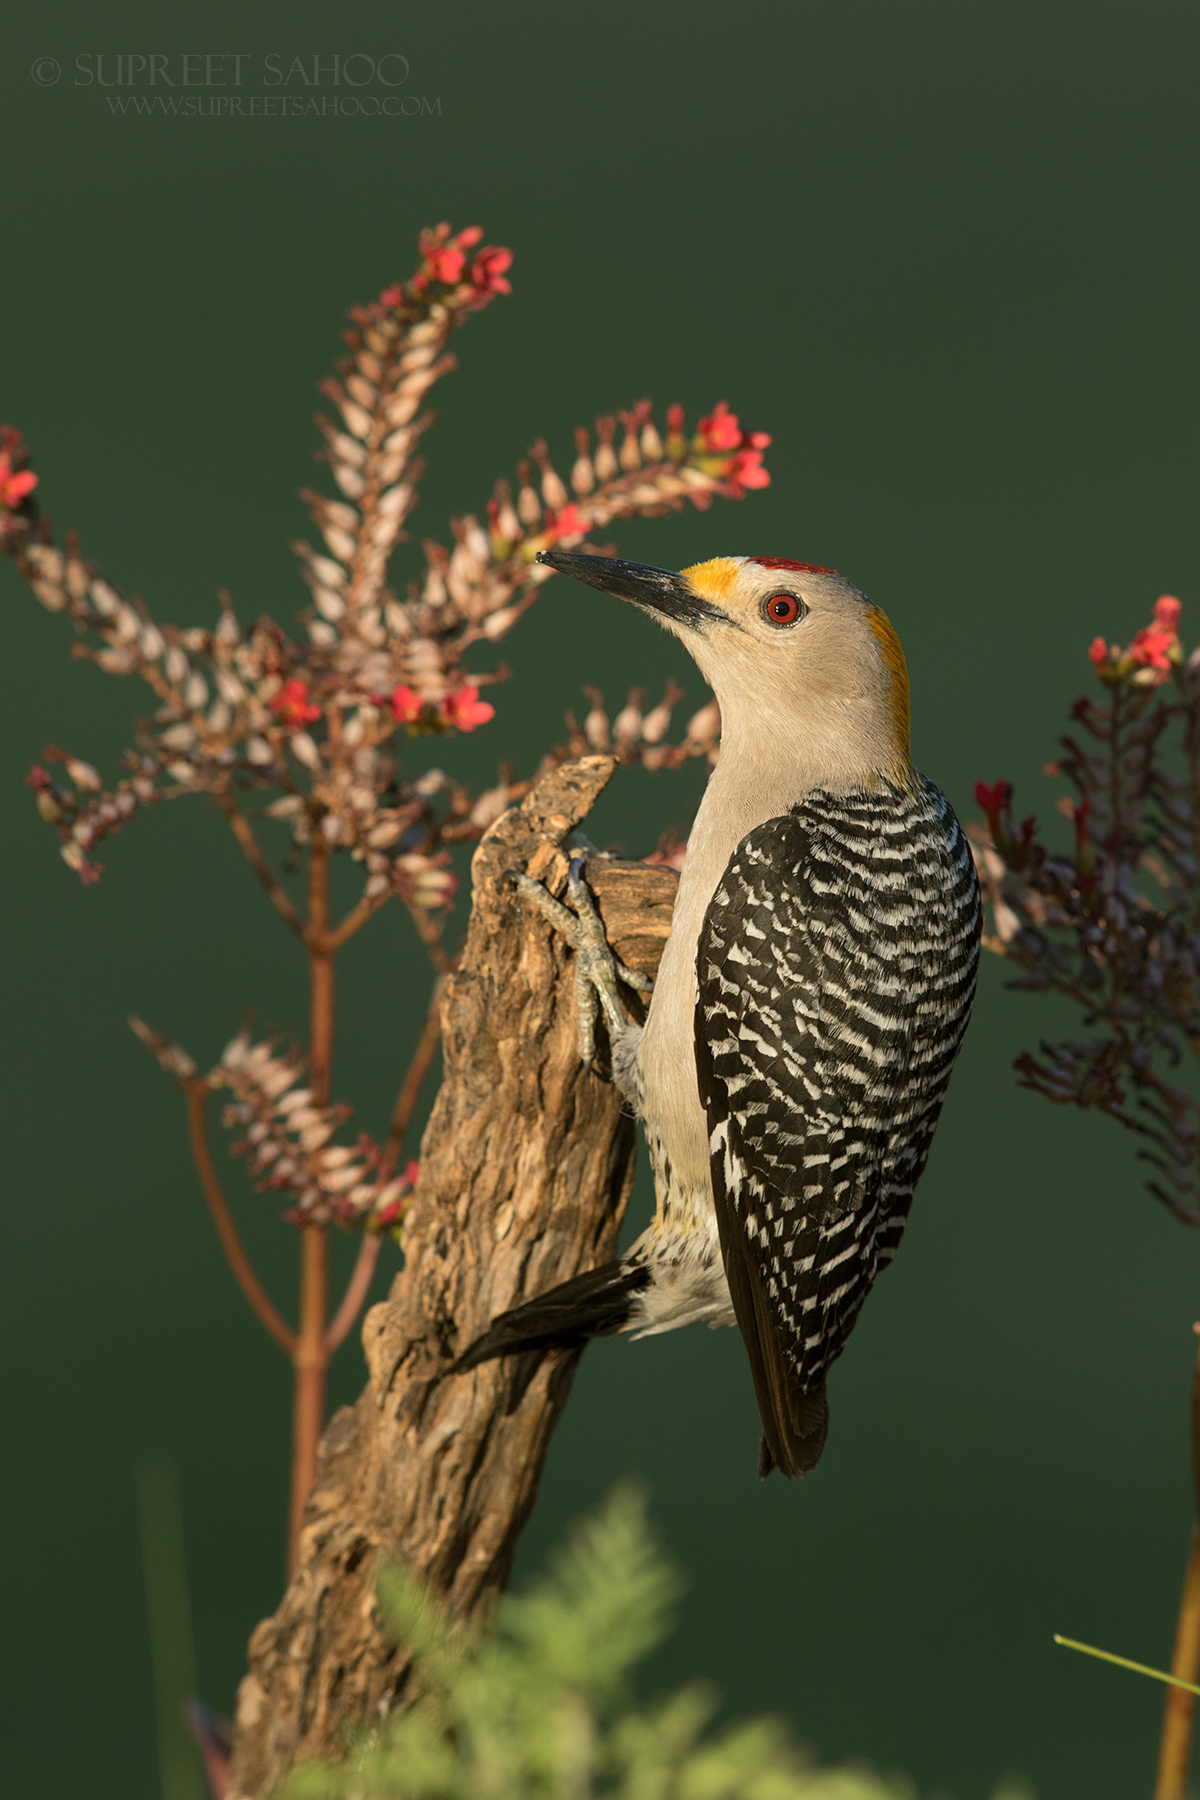 Capture tack-sharp images of rare birds.